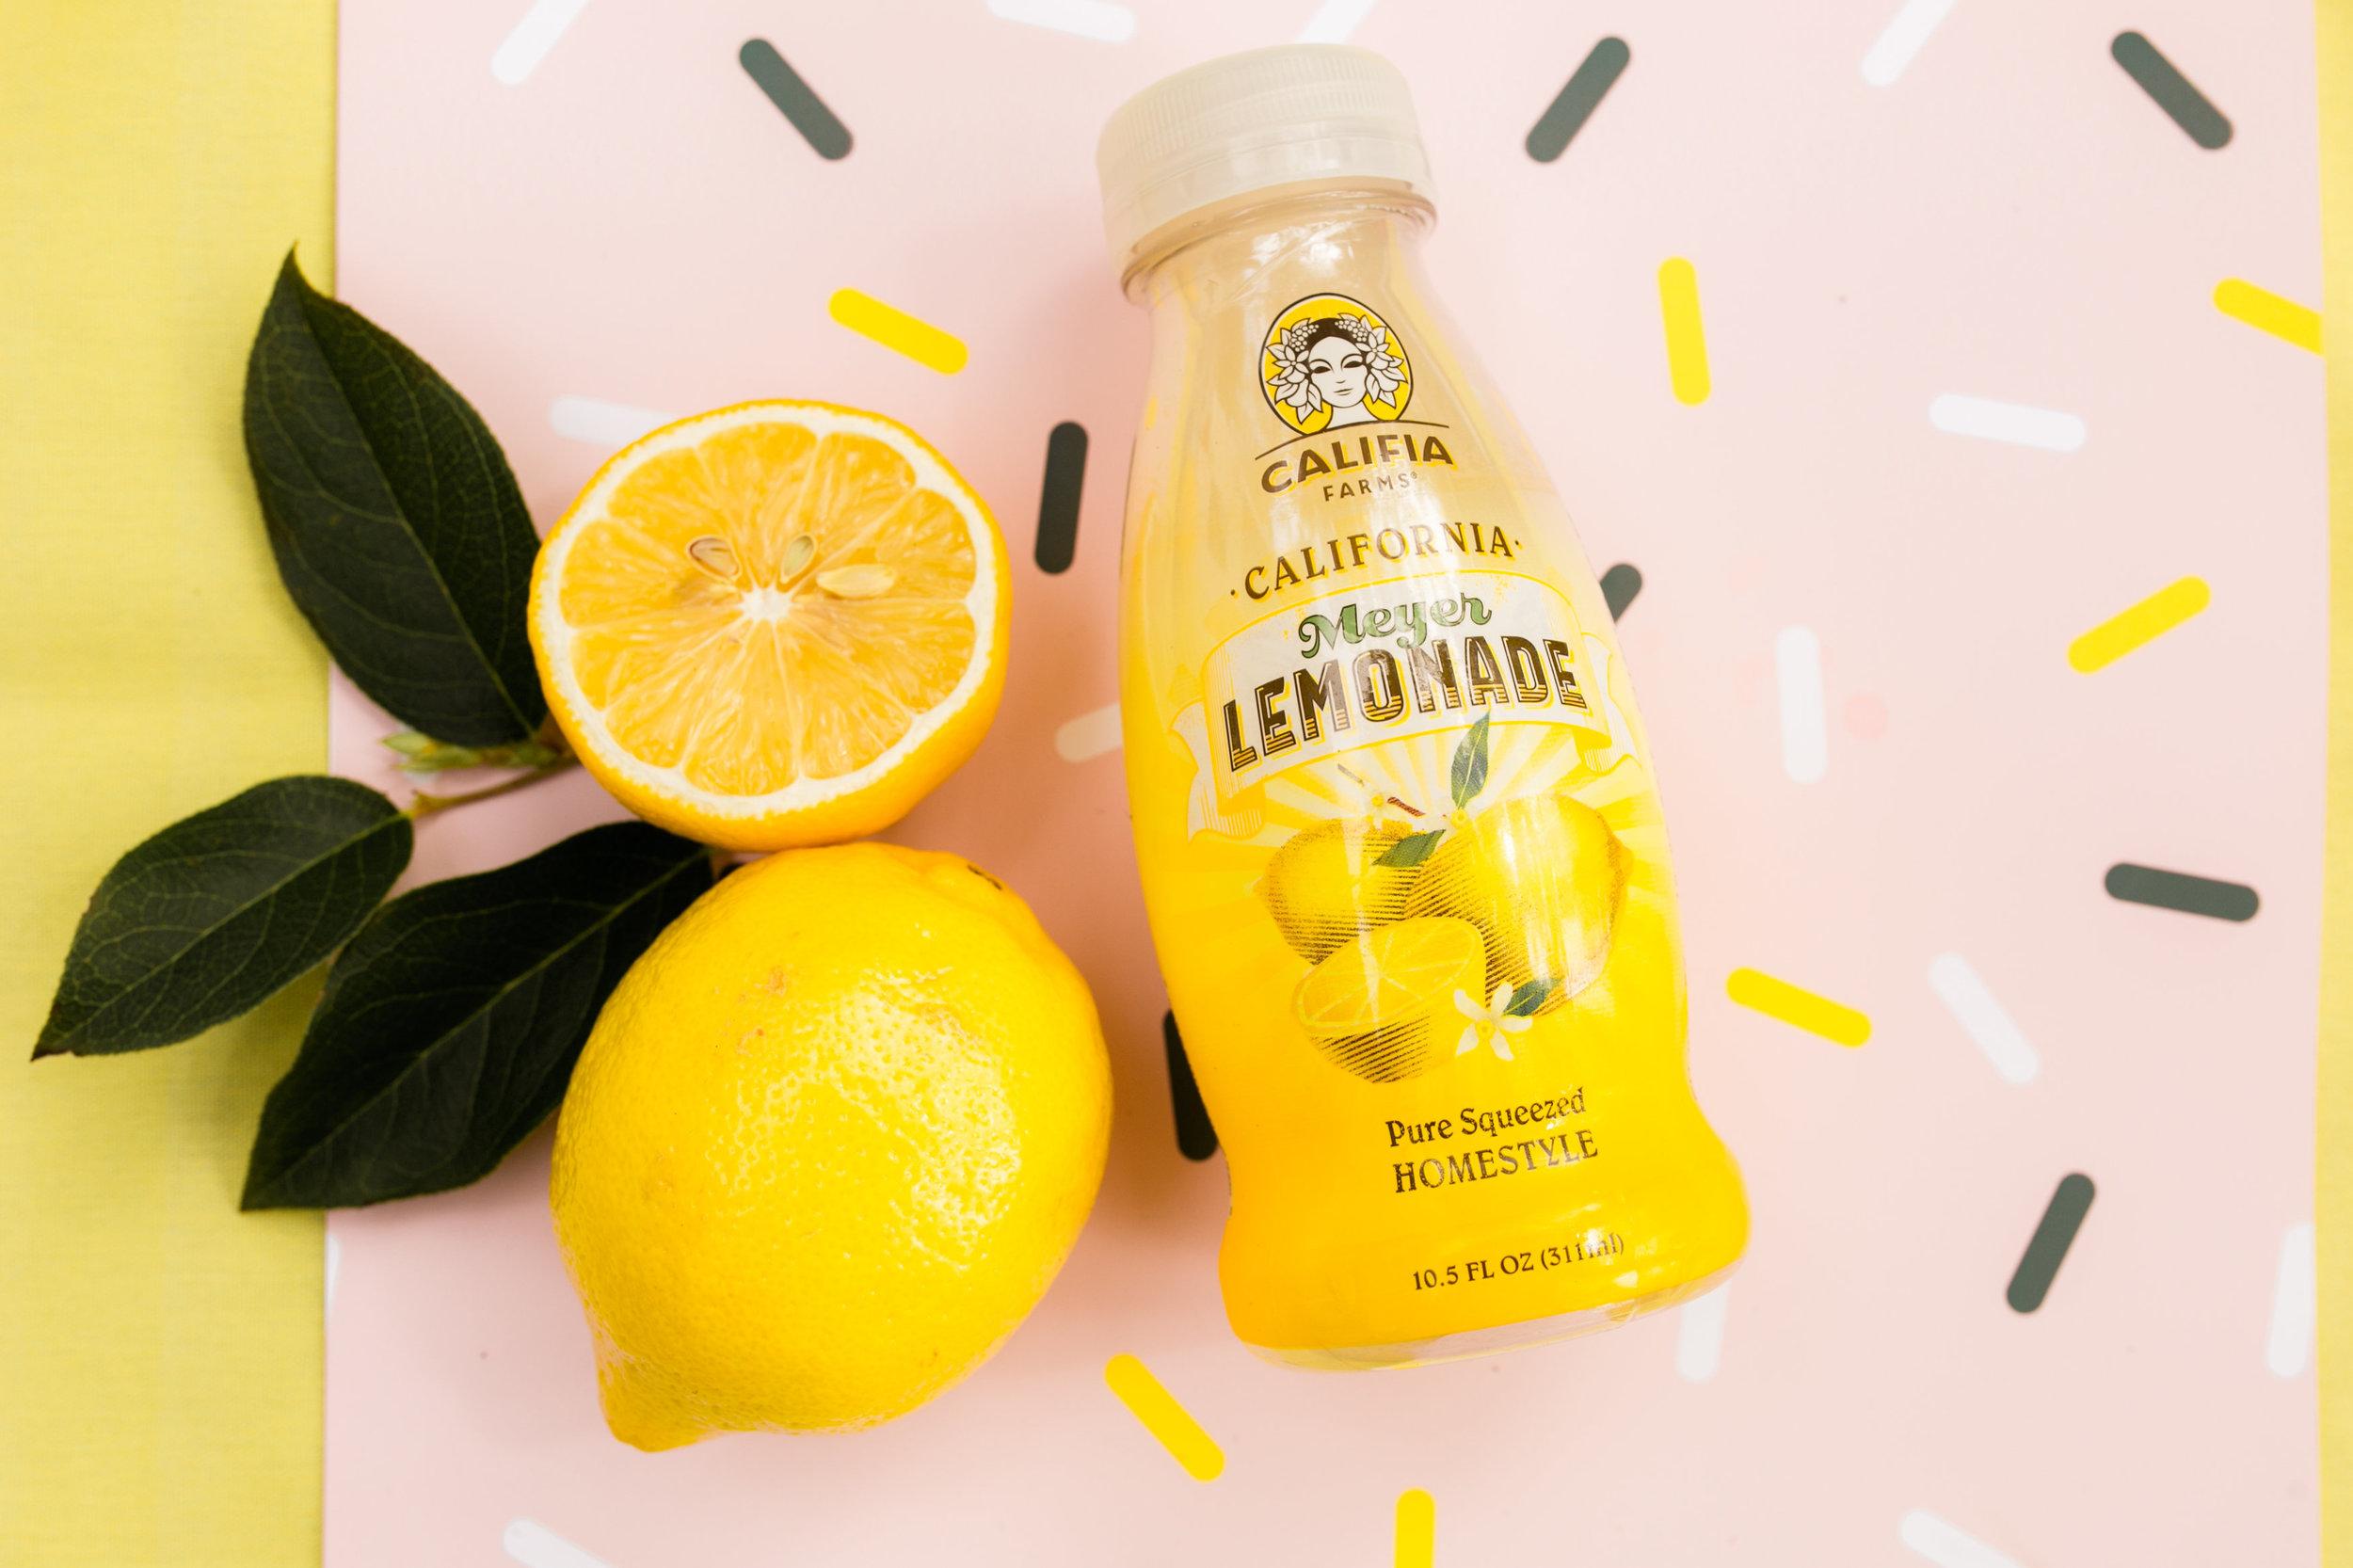 Lemonade Stand Califia Farms Lemonade - Custom Paper from Midnight Confetti